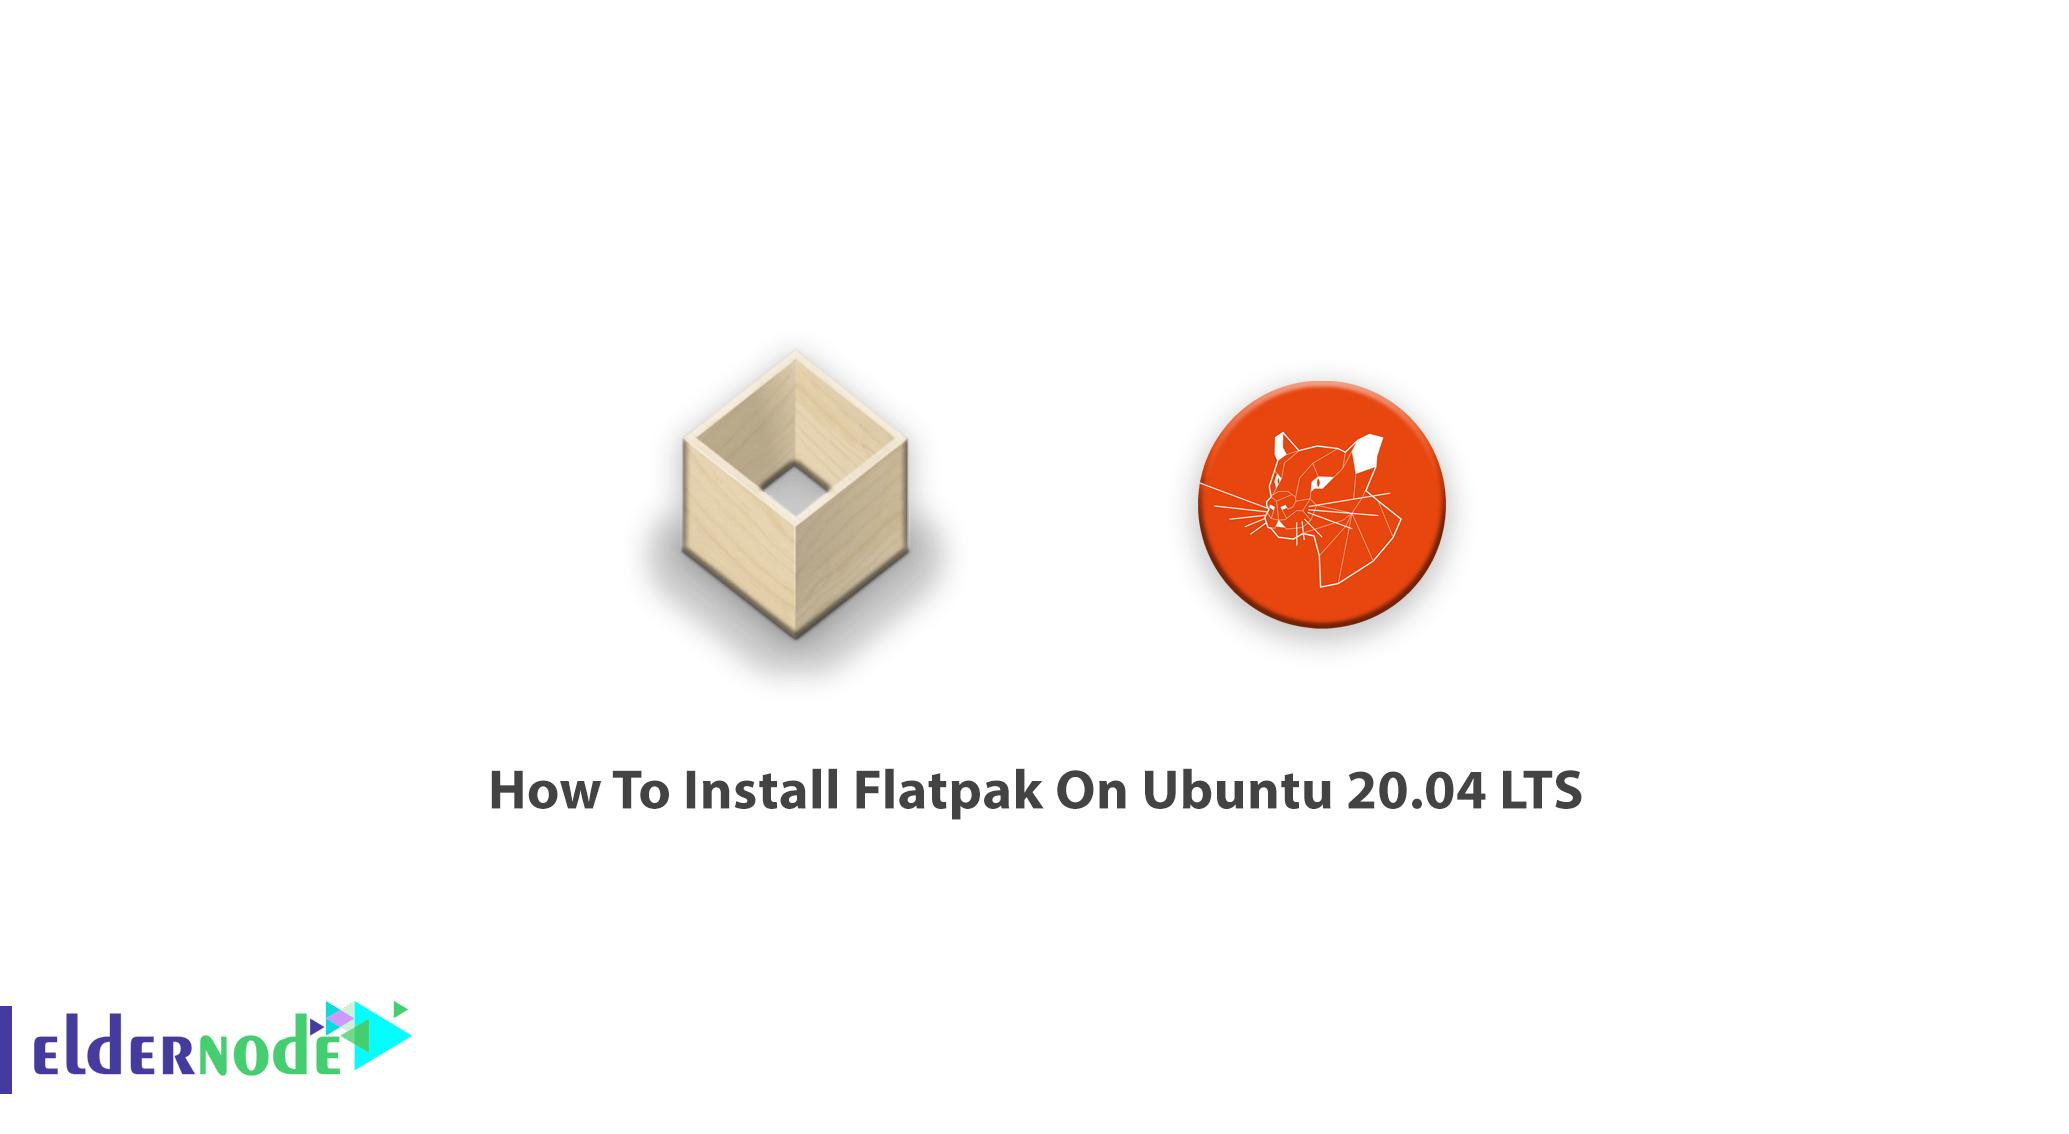 How To Install Flatpak On Ubuntu 20.04 LTS